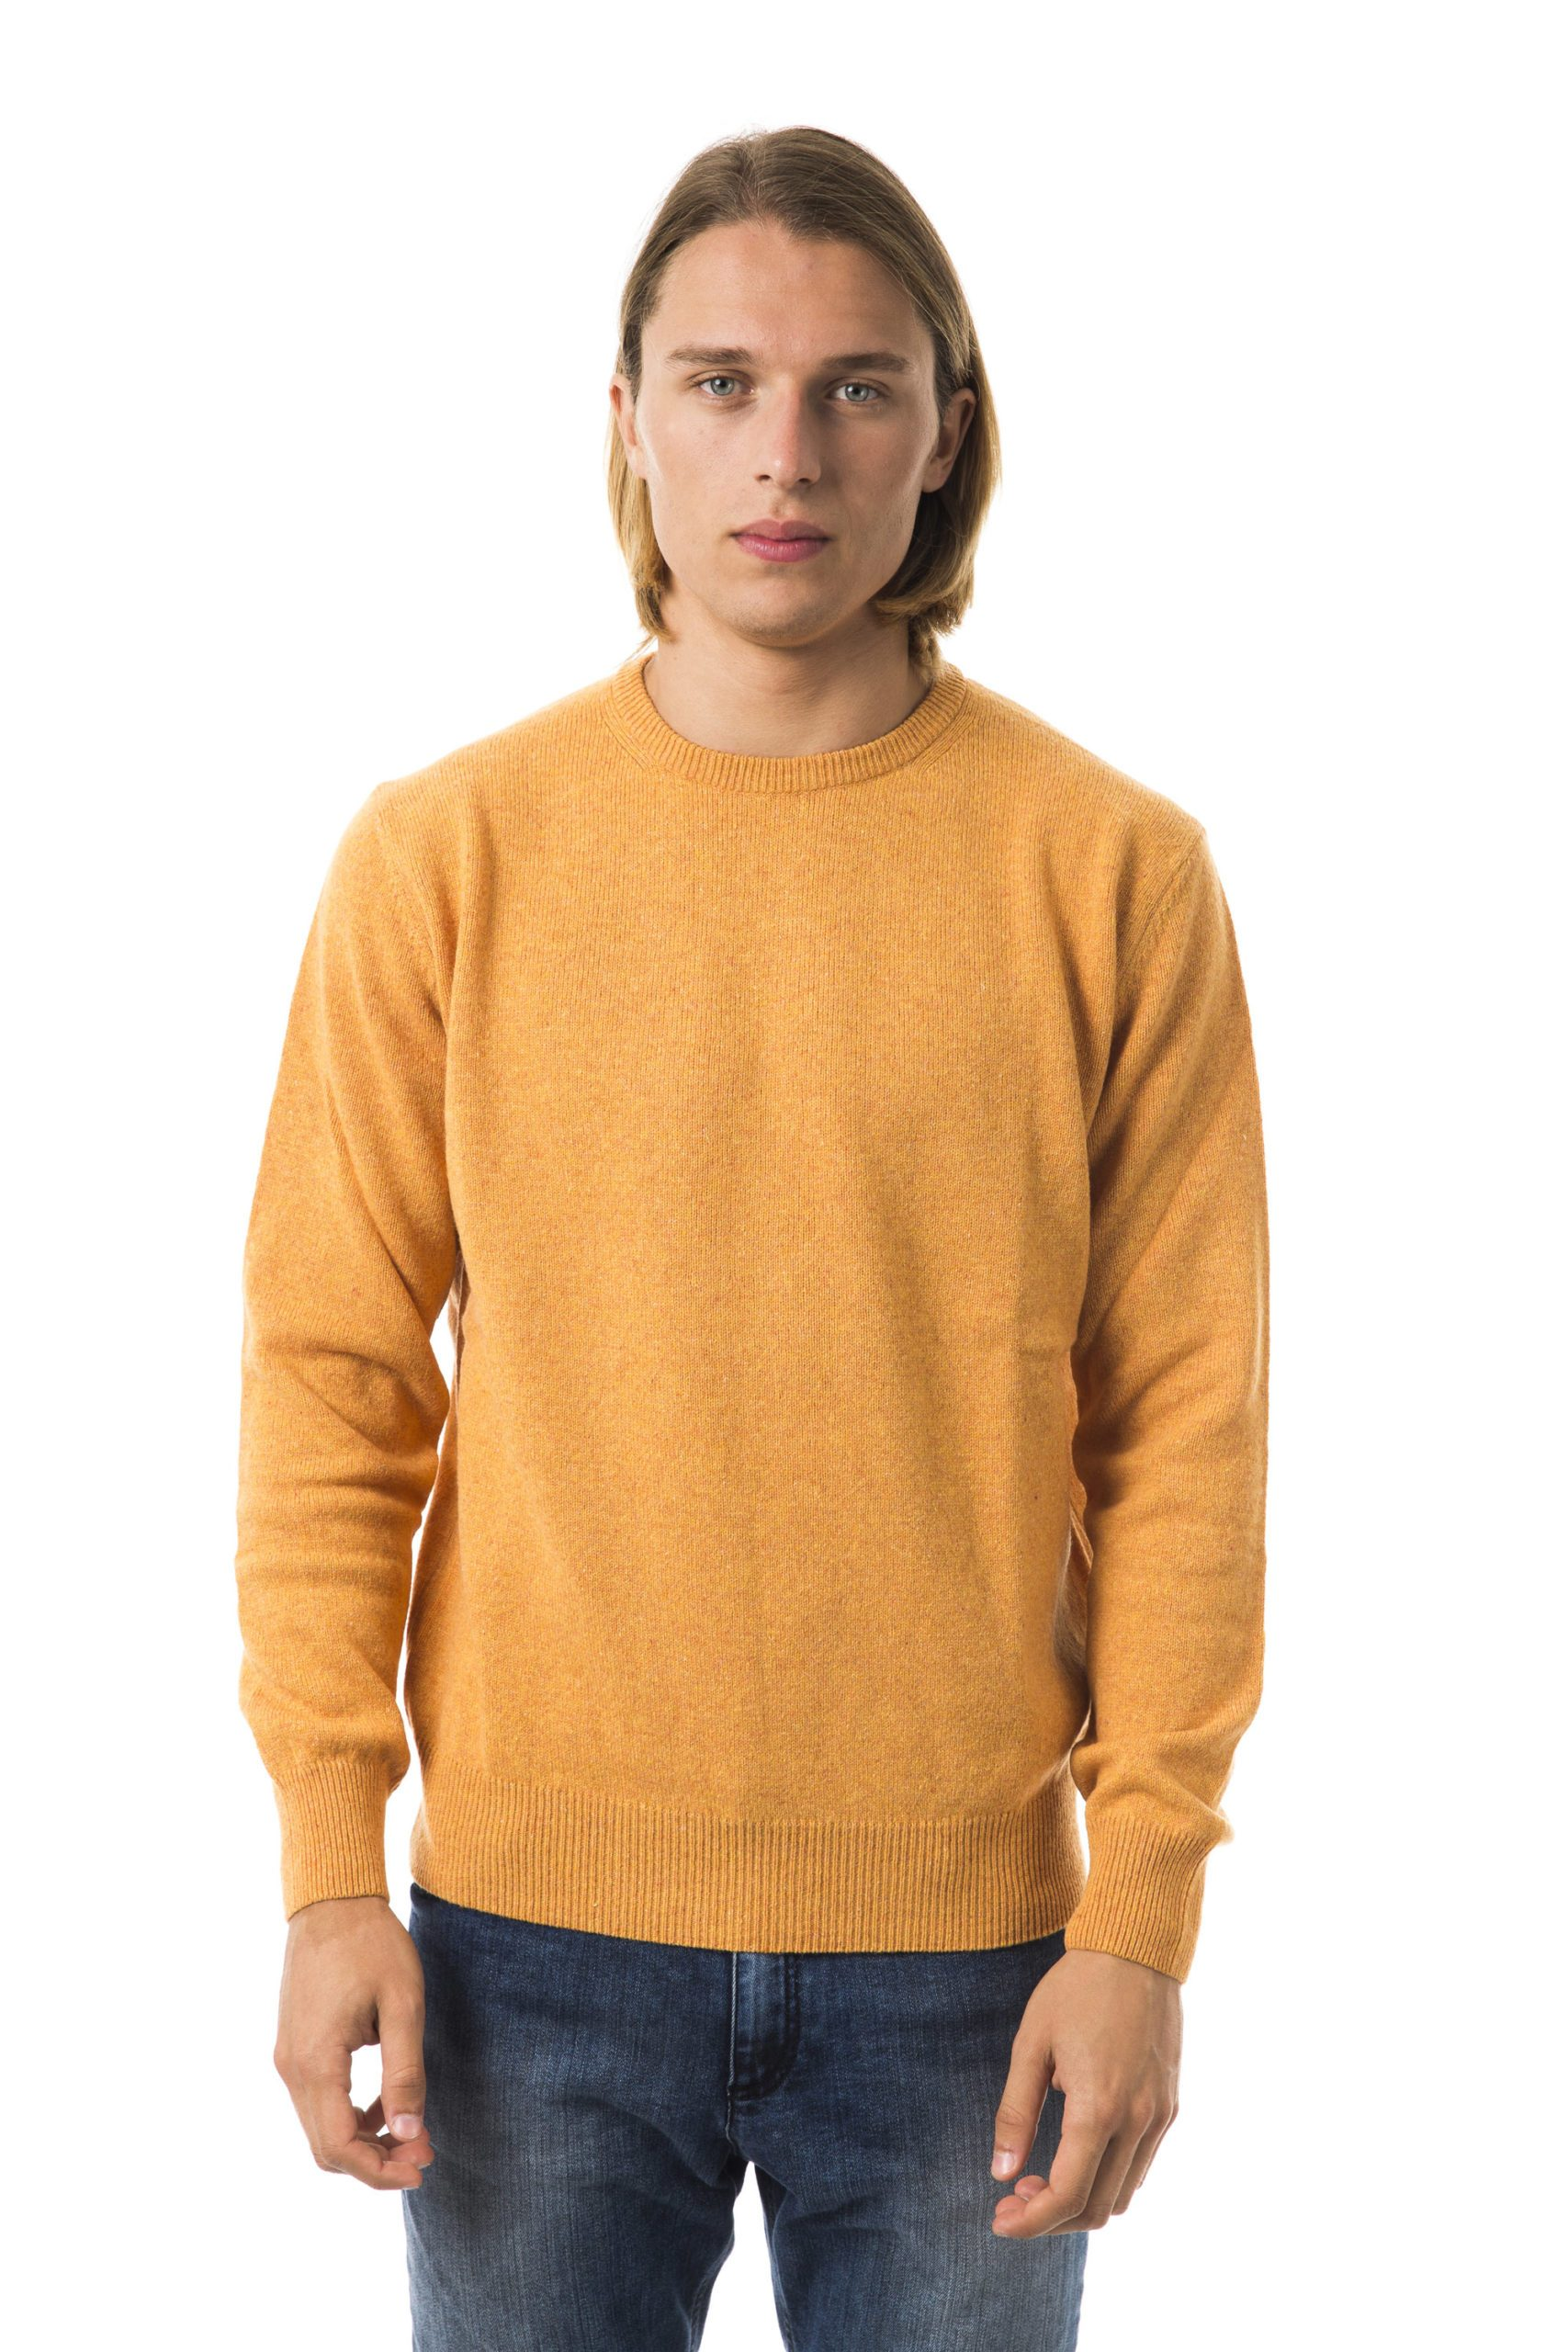 Uominitaliani Men's M A N D A R. Sweater Orange UO815850 - M